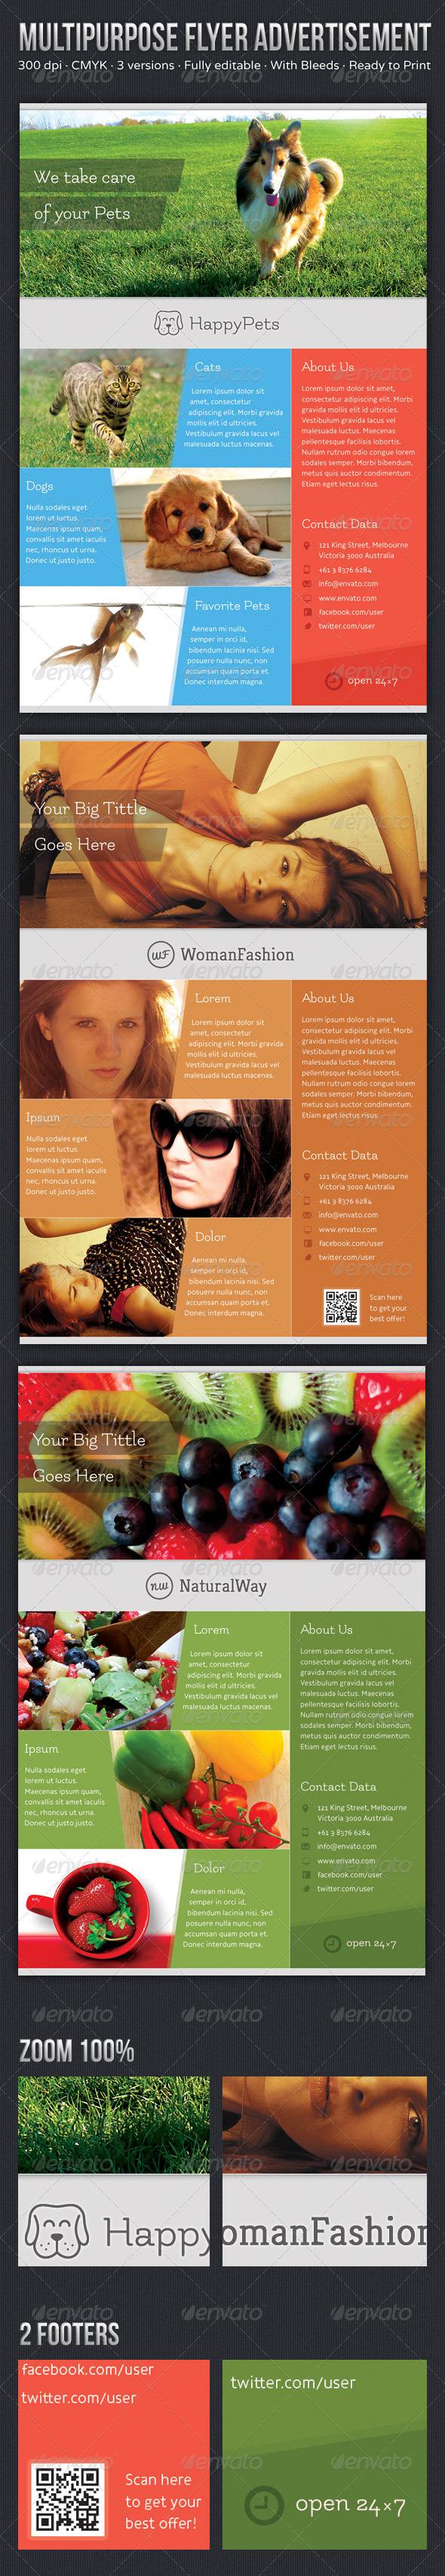 GraphicRiver Multipurpose Flyer Advertisement Volume 2 5689338